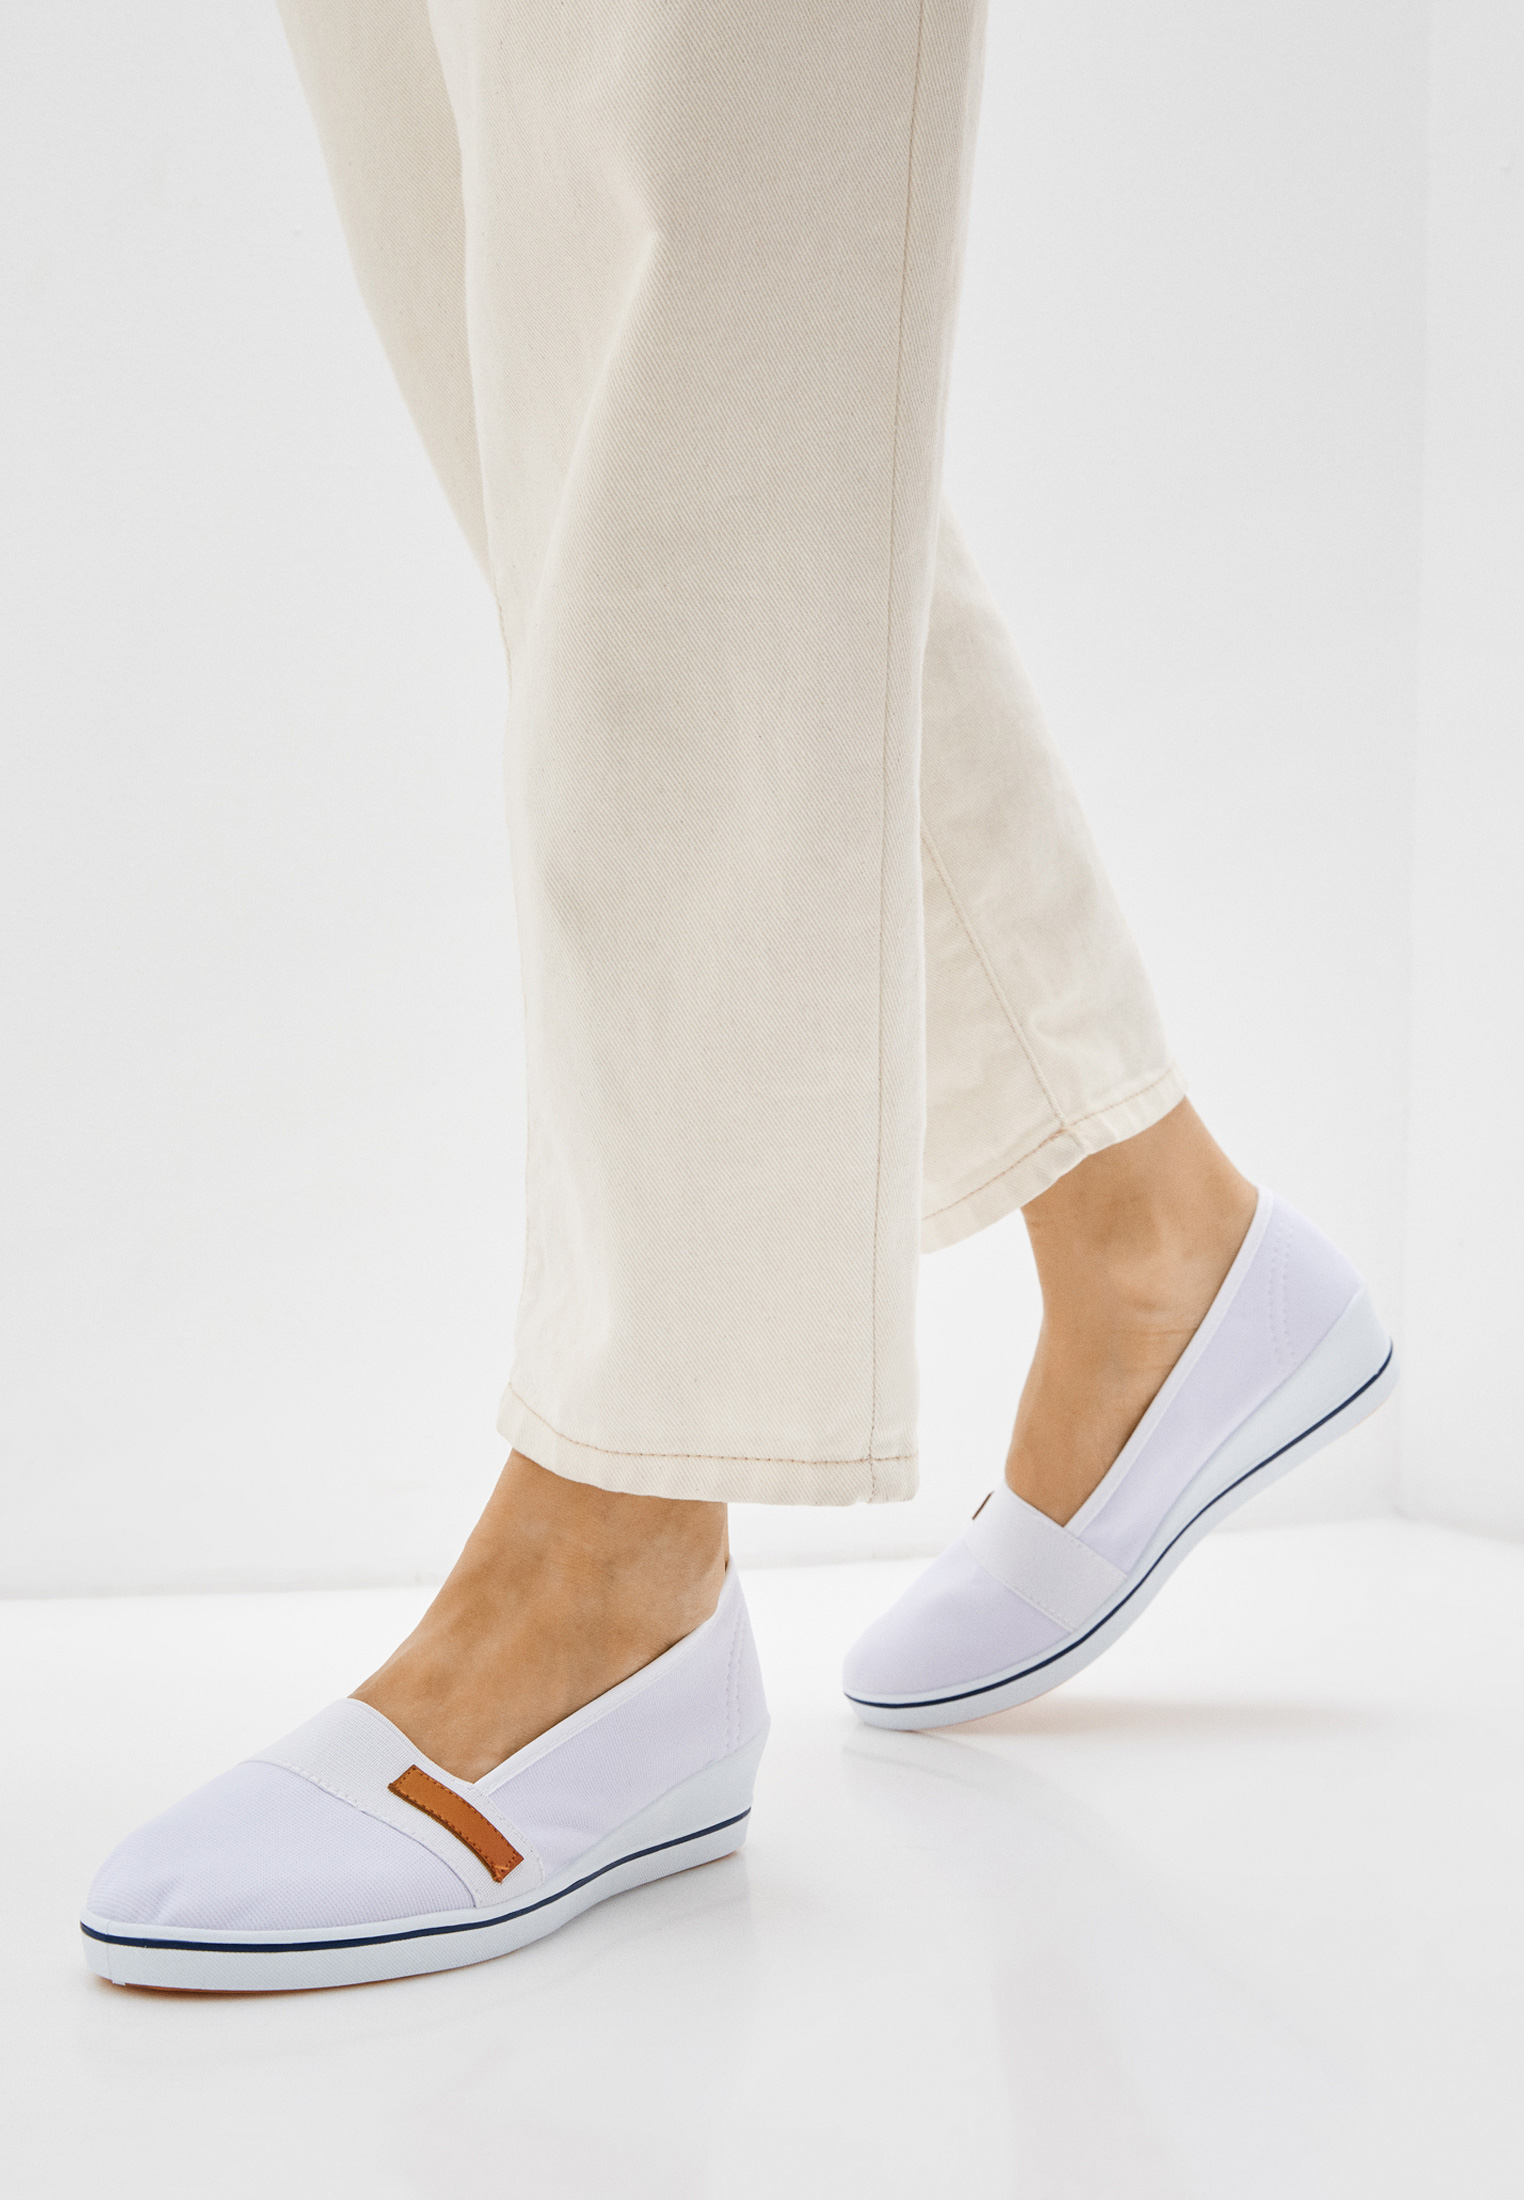 Женские туфли Exquily Y6035